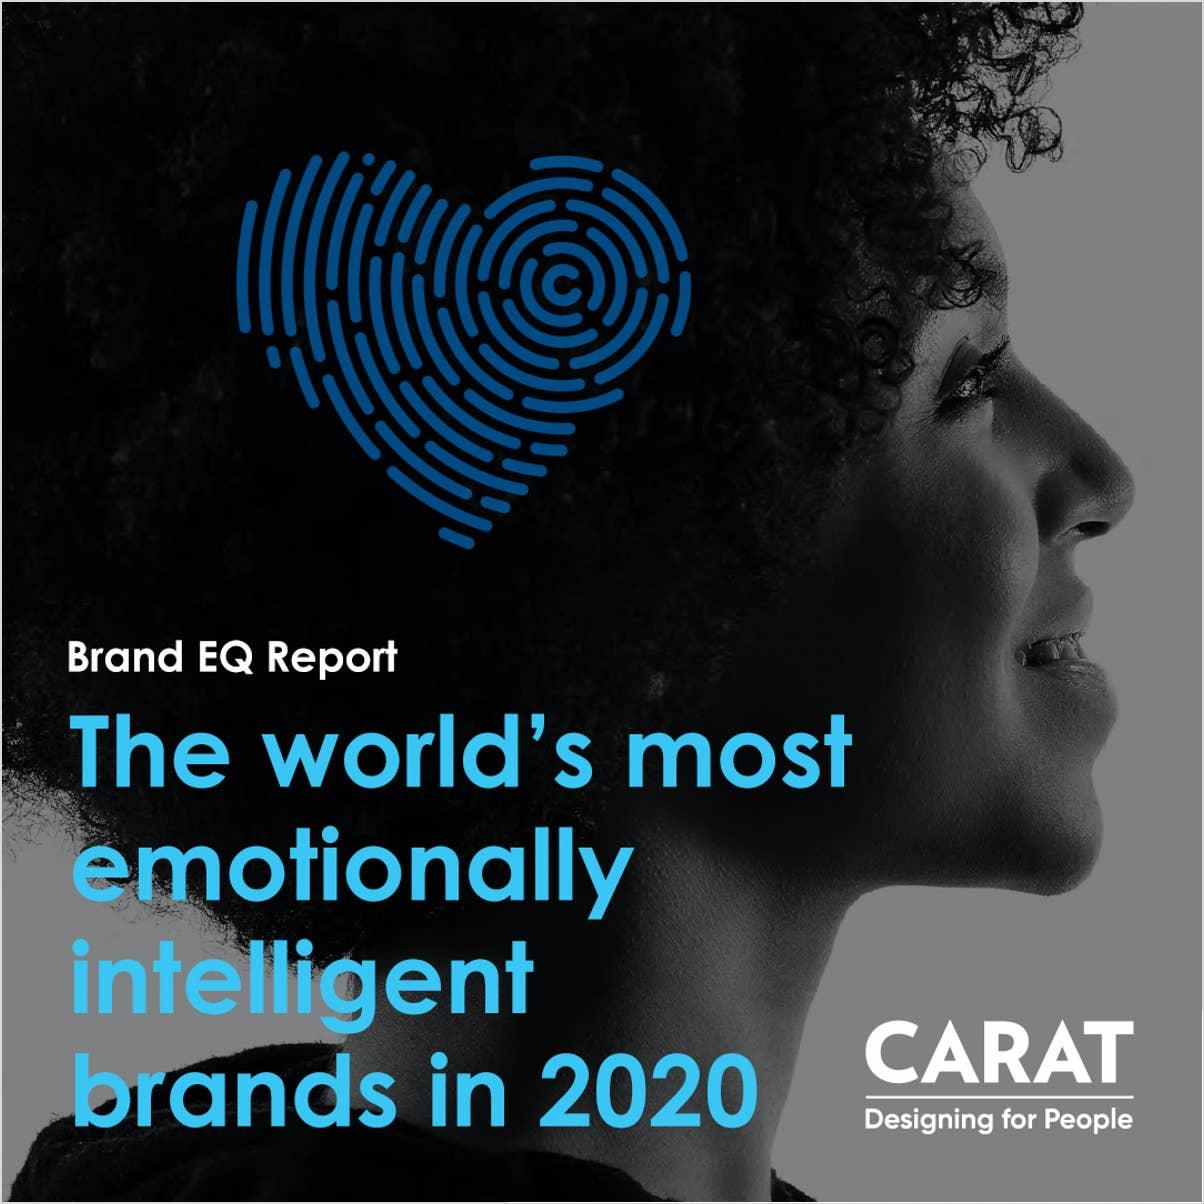 Carat Brand EQ Report